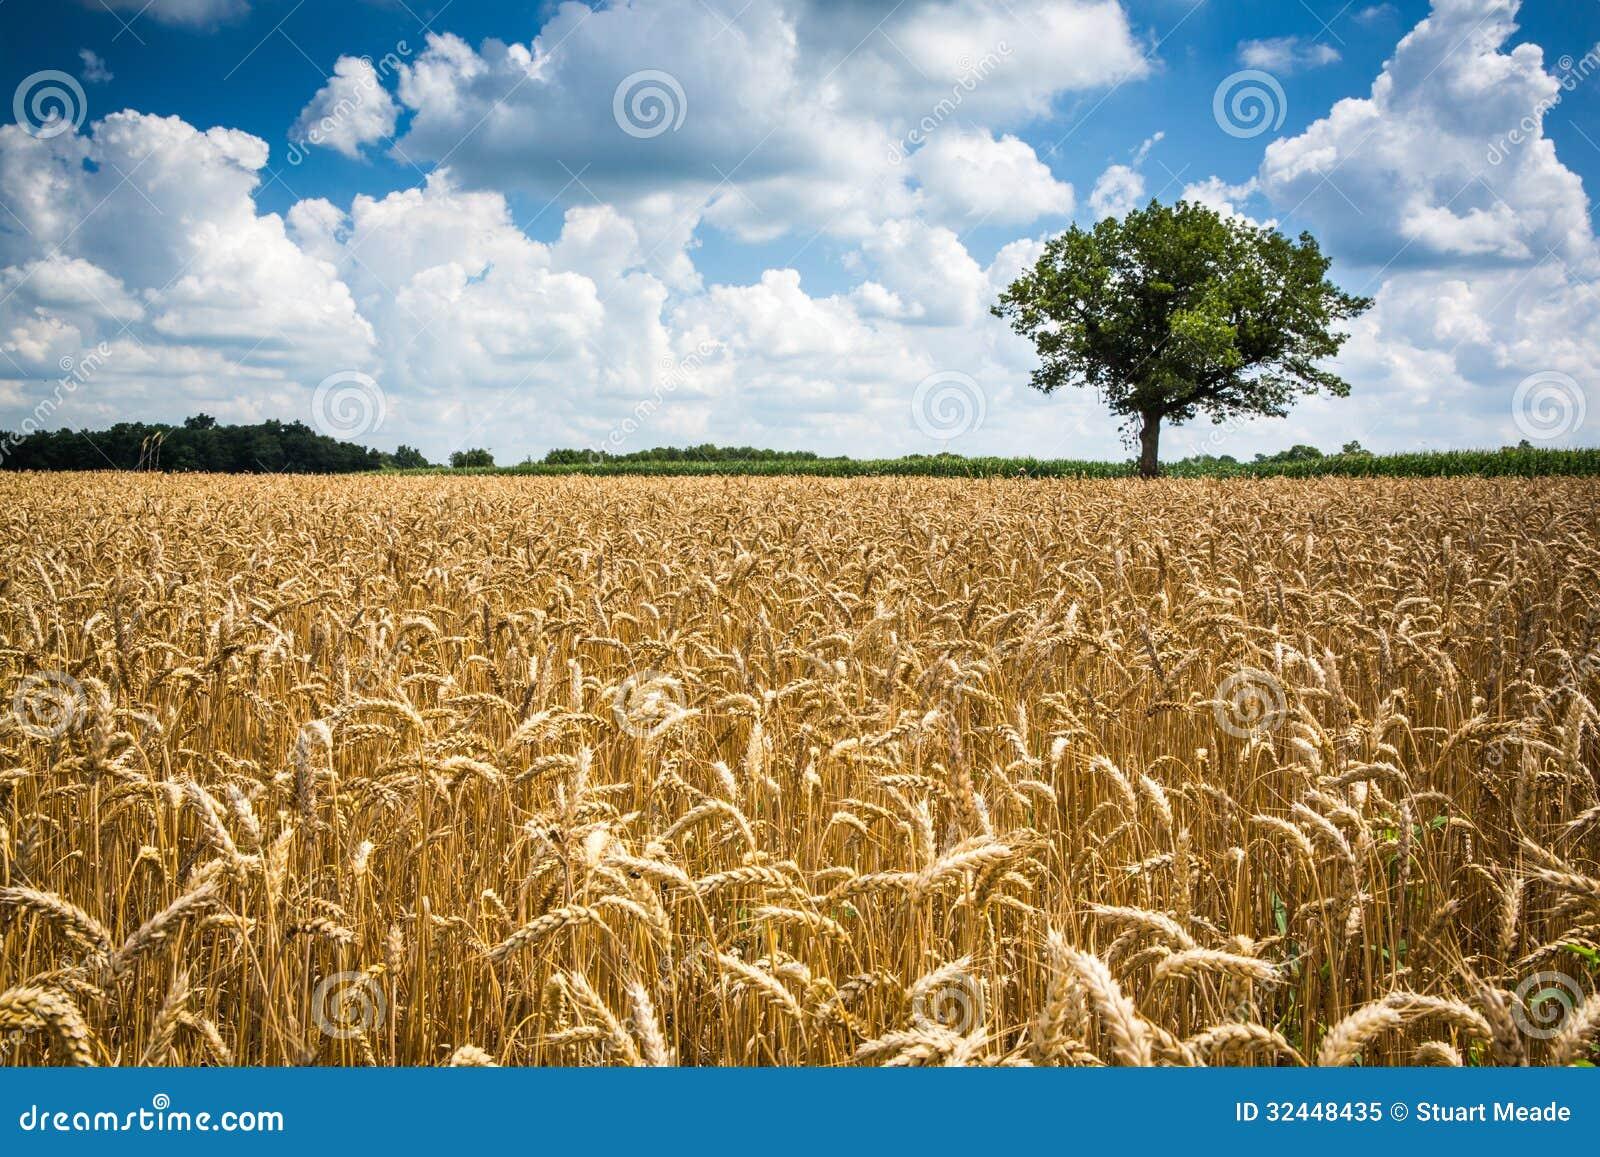 Farm Wheat Field Royalty Free Stock Photo Image 32448435